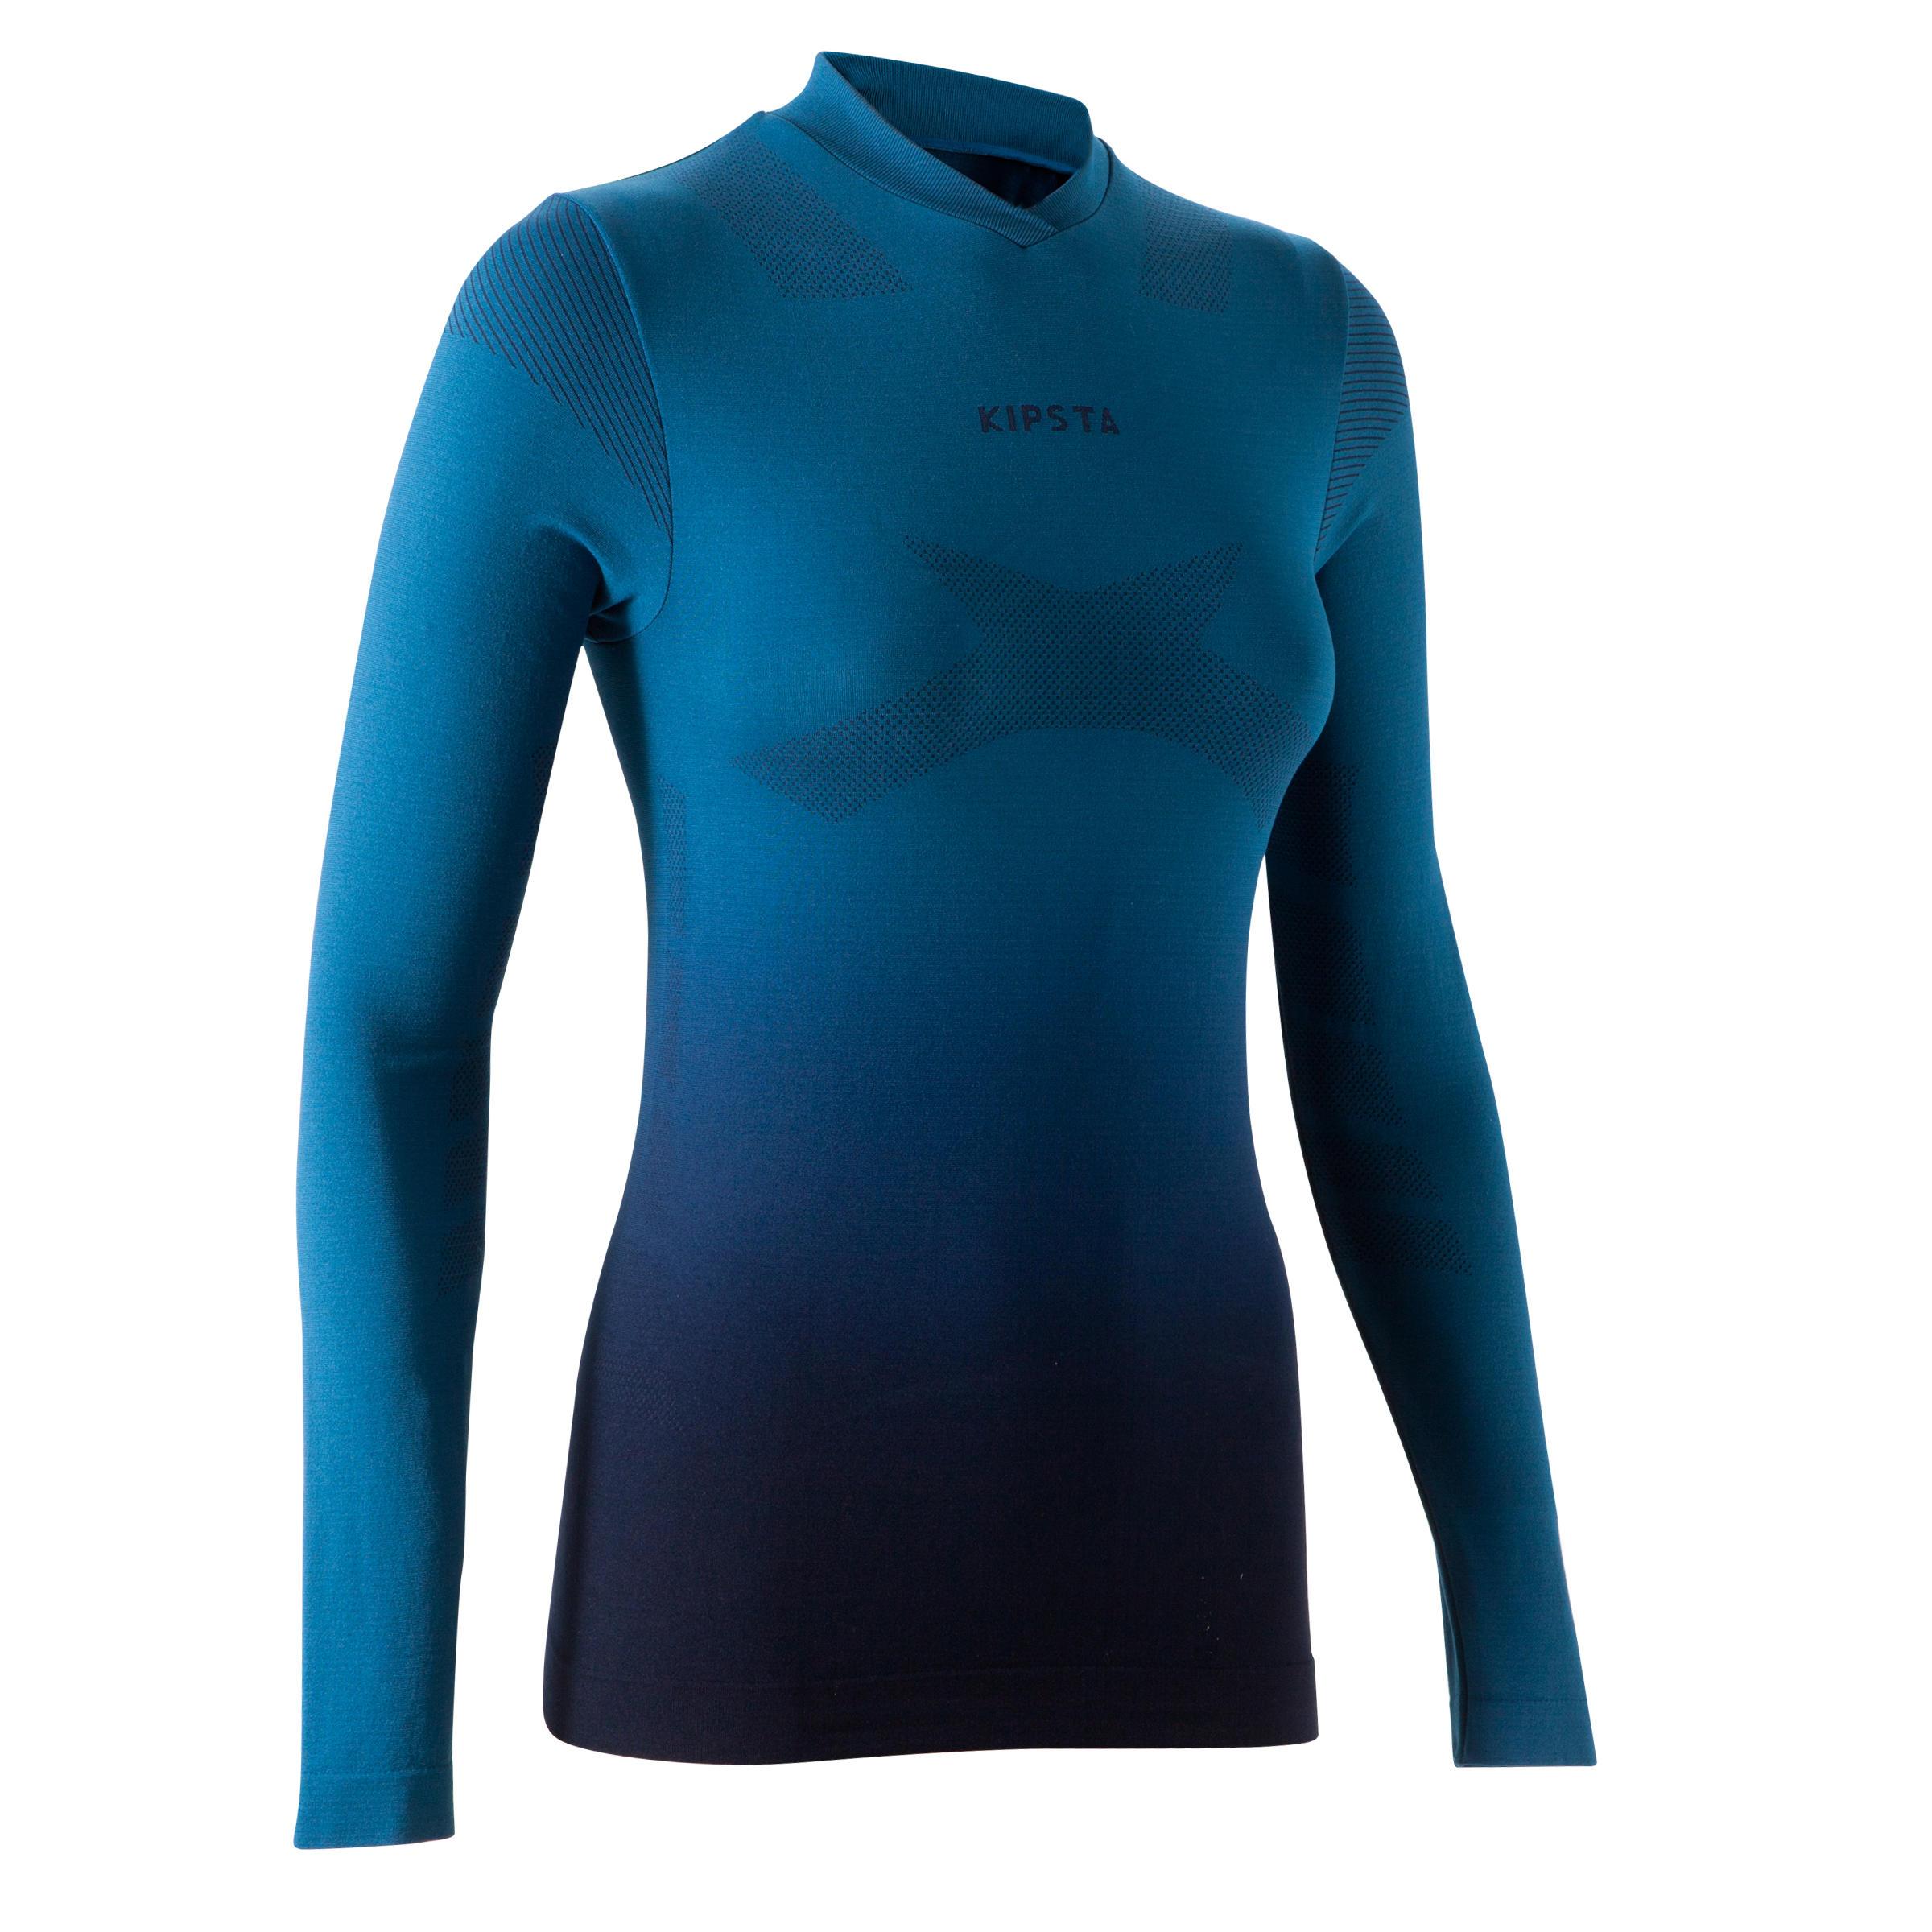 Keepdry500 Women's Long-Sleeved Base Layer - Blue